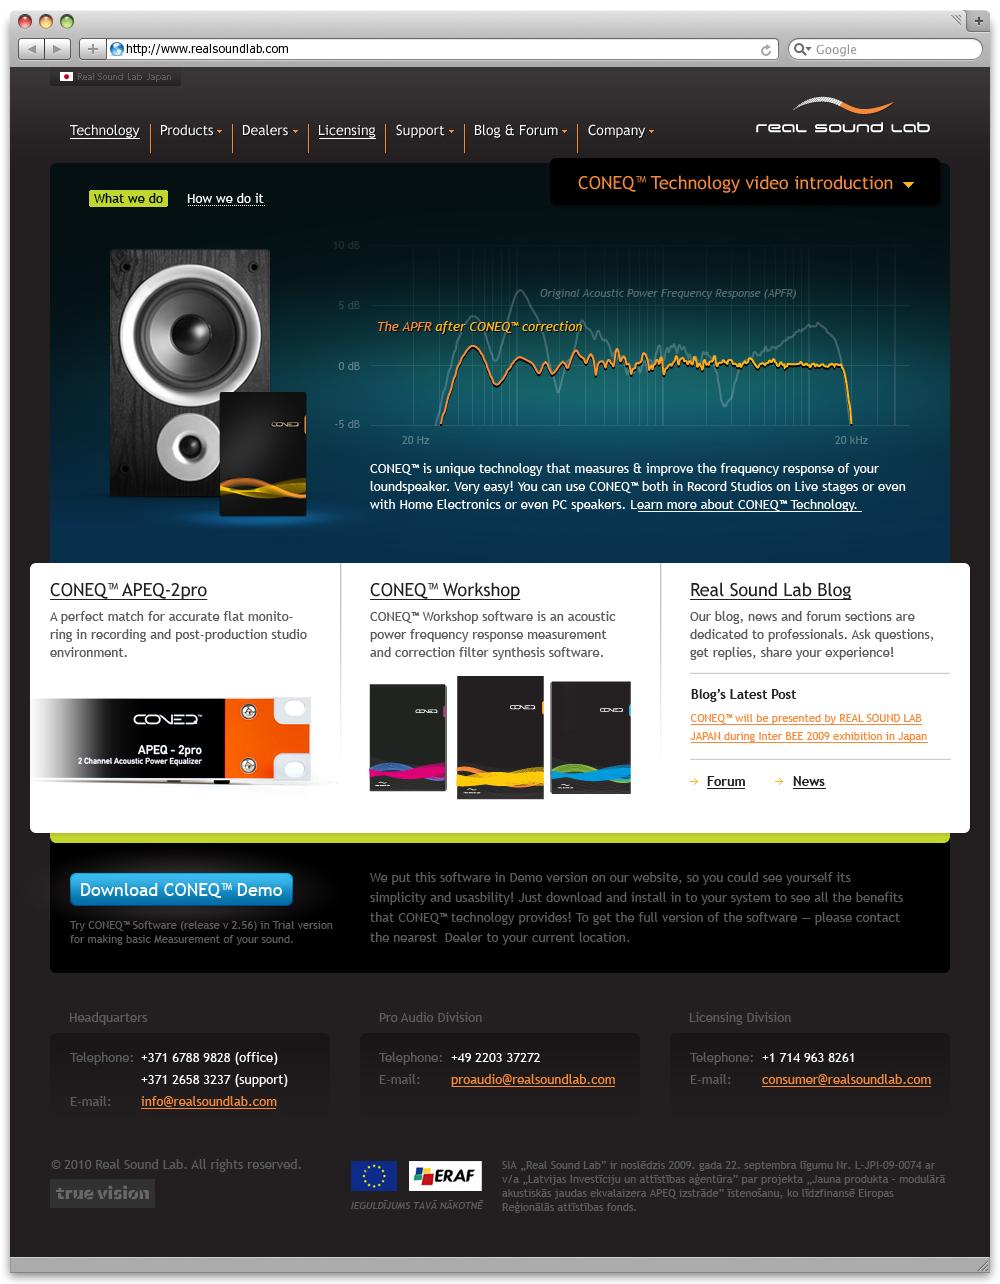 Real Sound Lab